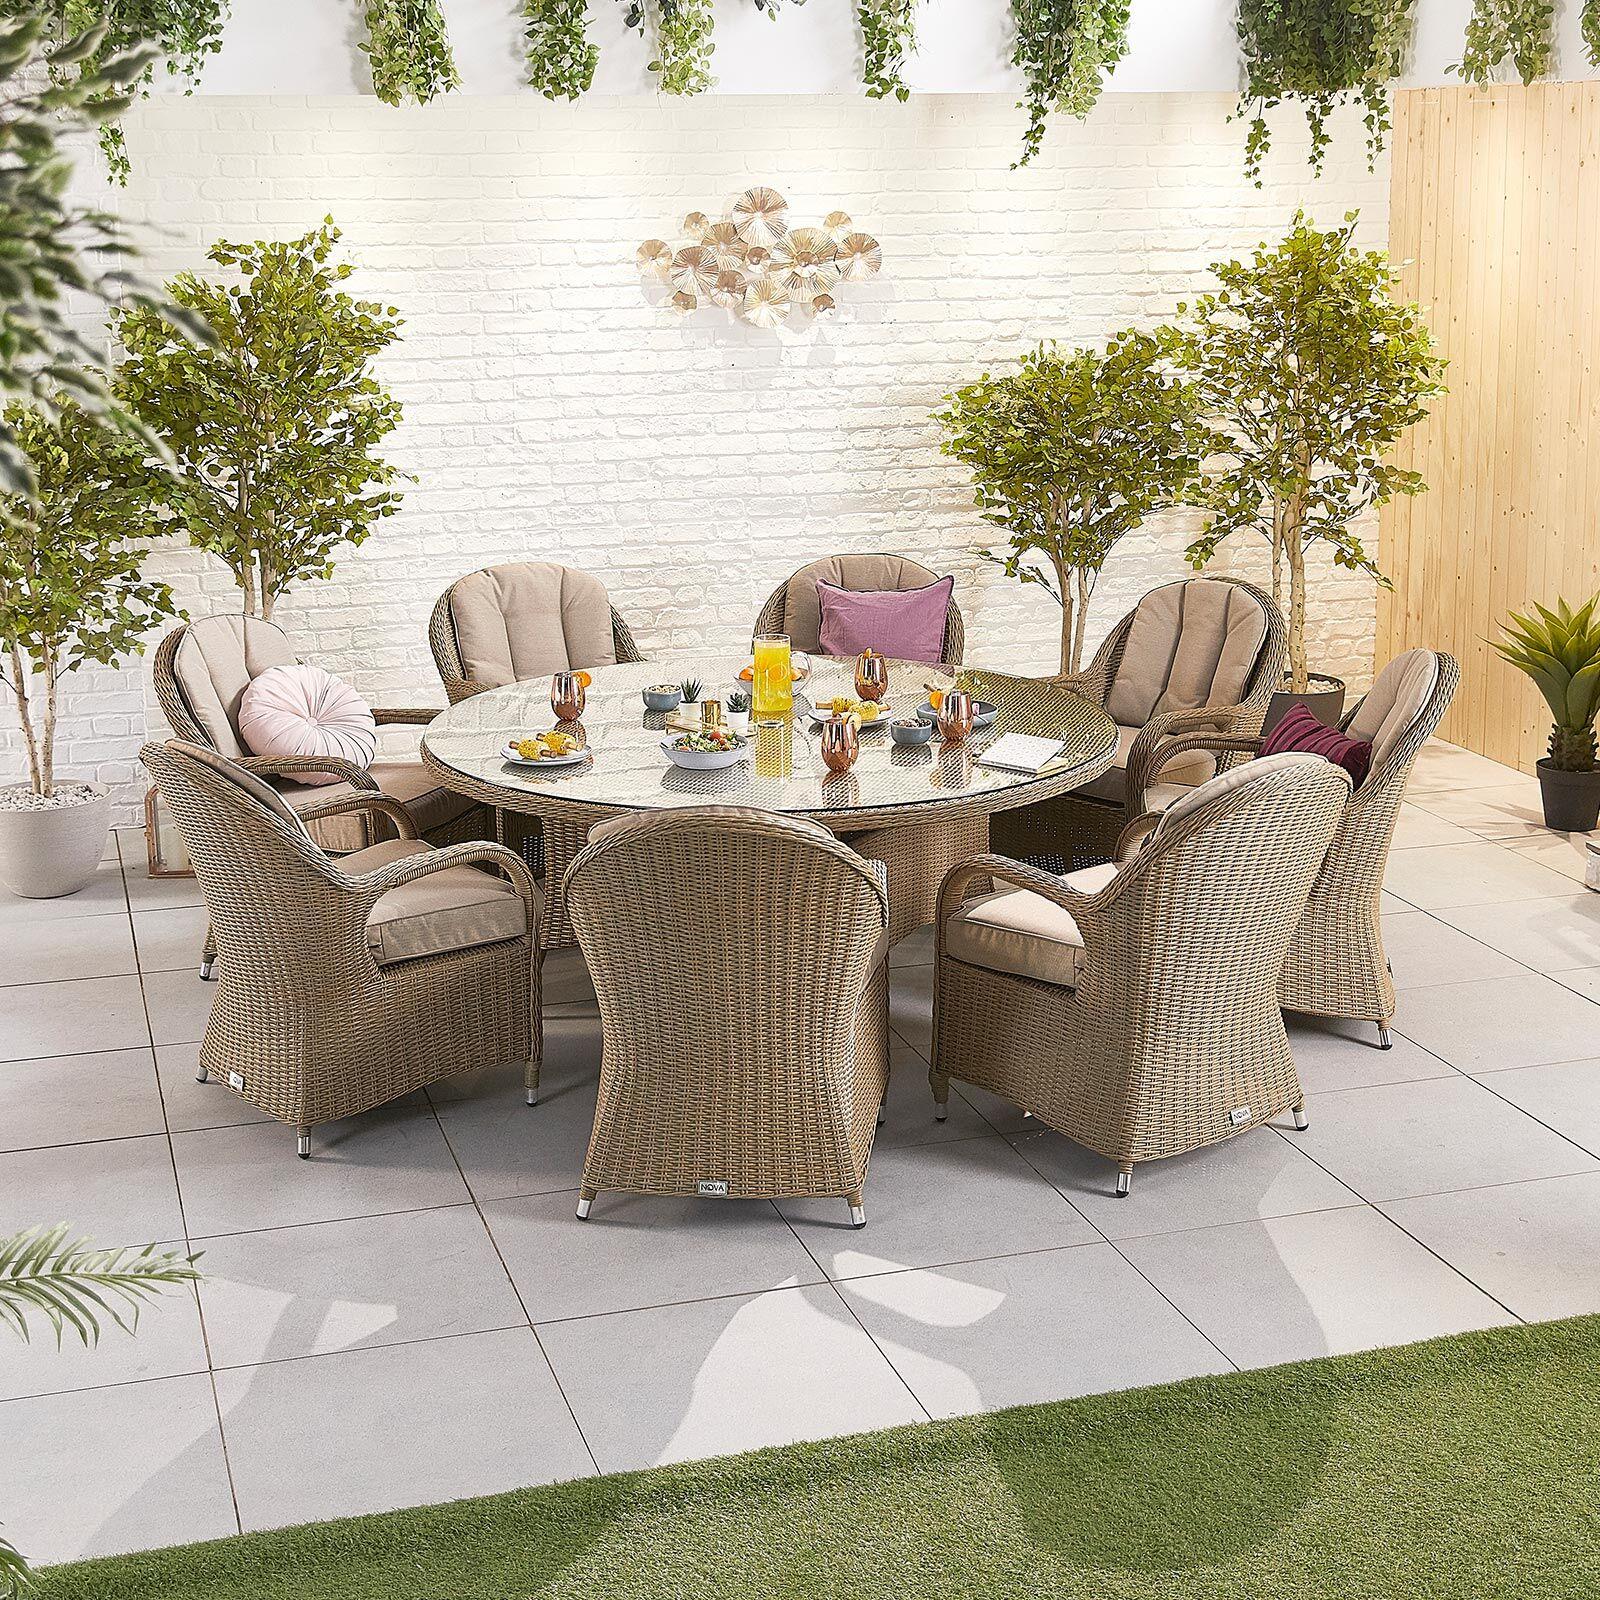 Oakworld Alfresco Heritage Leeanna 8 Seat Dining Set   1.8m Round Table   Willow